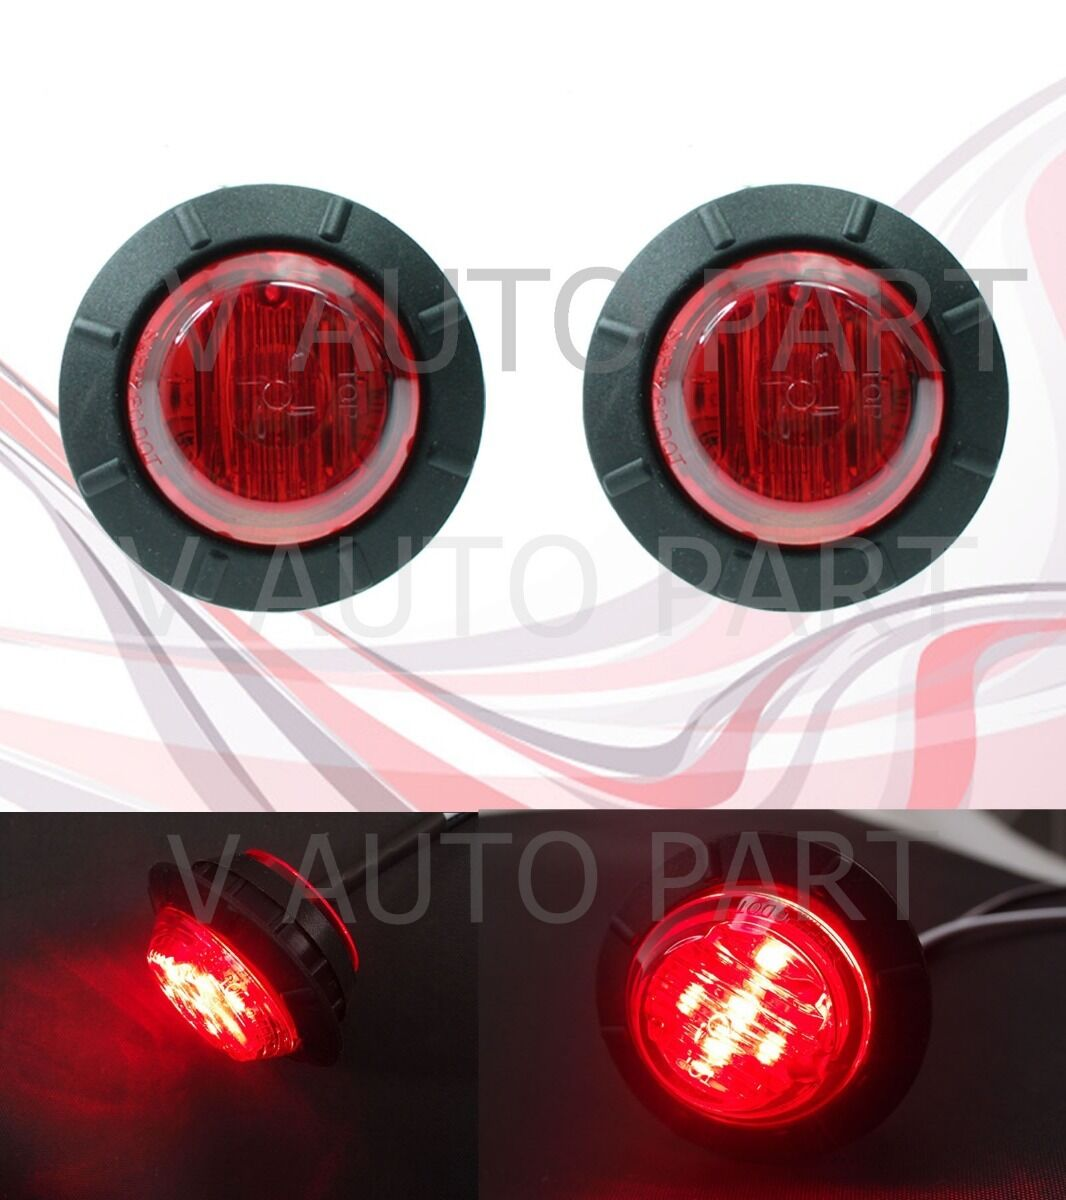 "10X 12V Round Side White 6 LED 1-1//4/"" Marker Light Boat Bus Navigation US Stock"